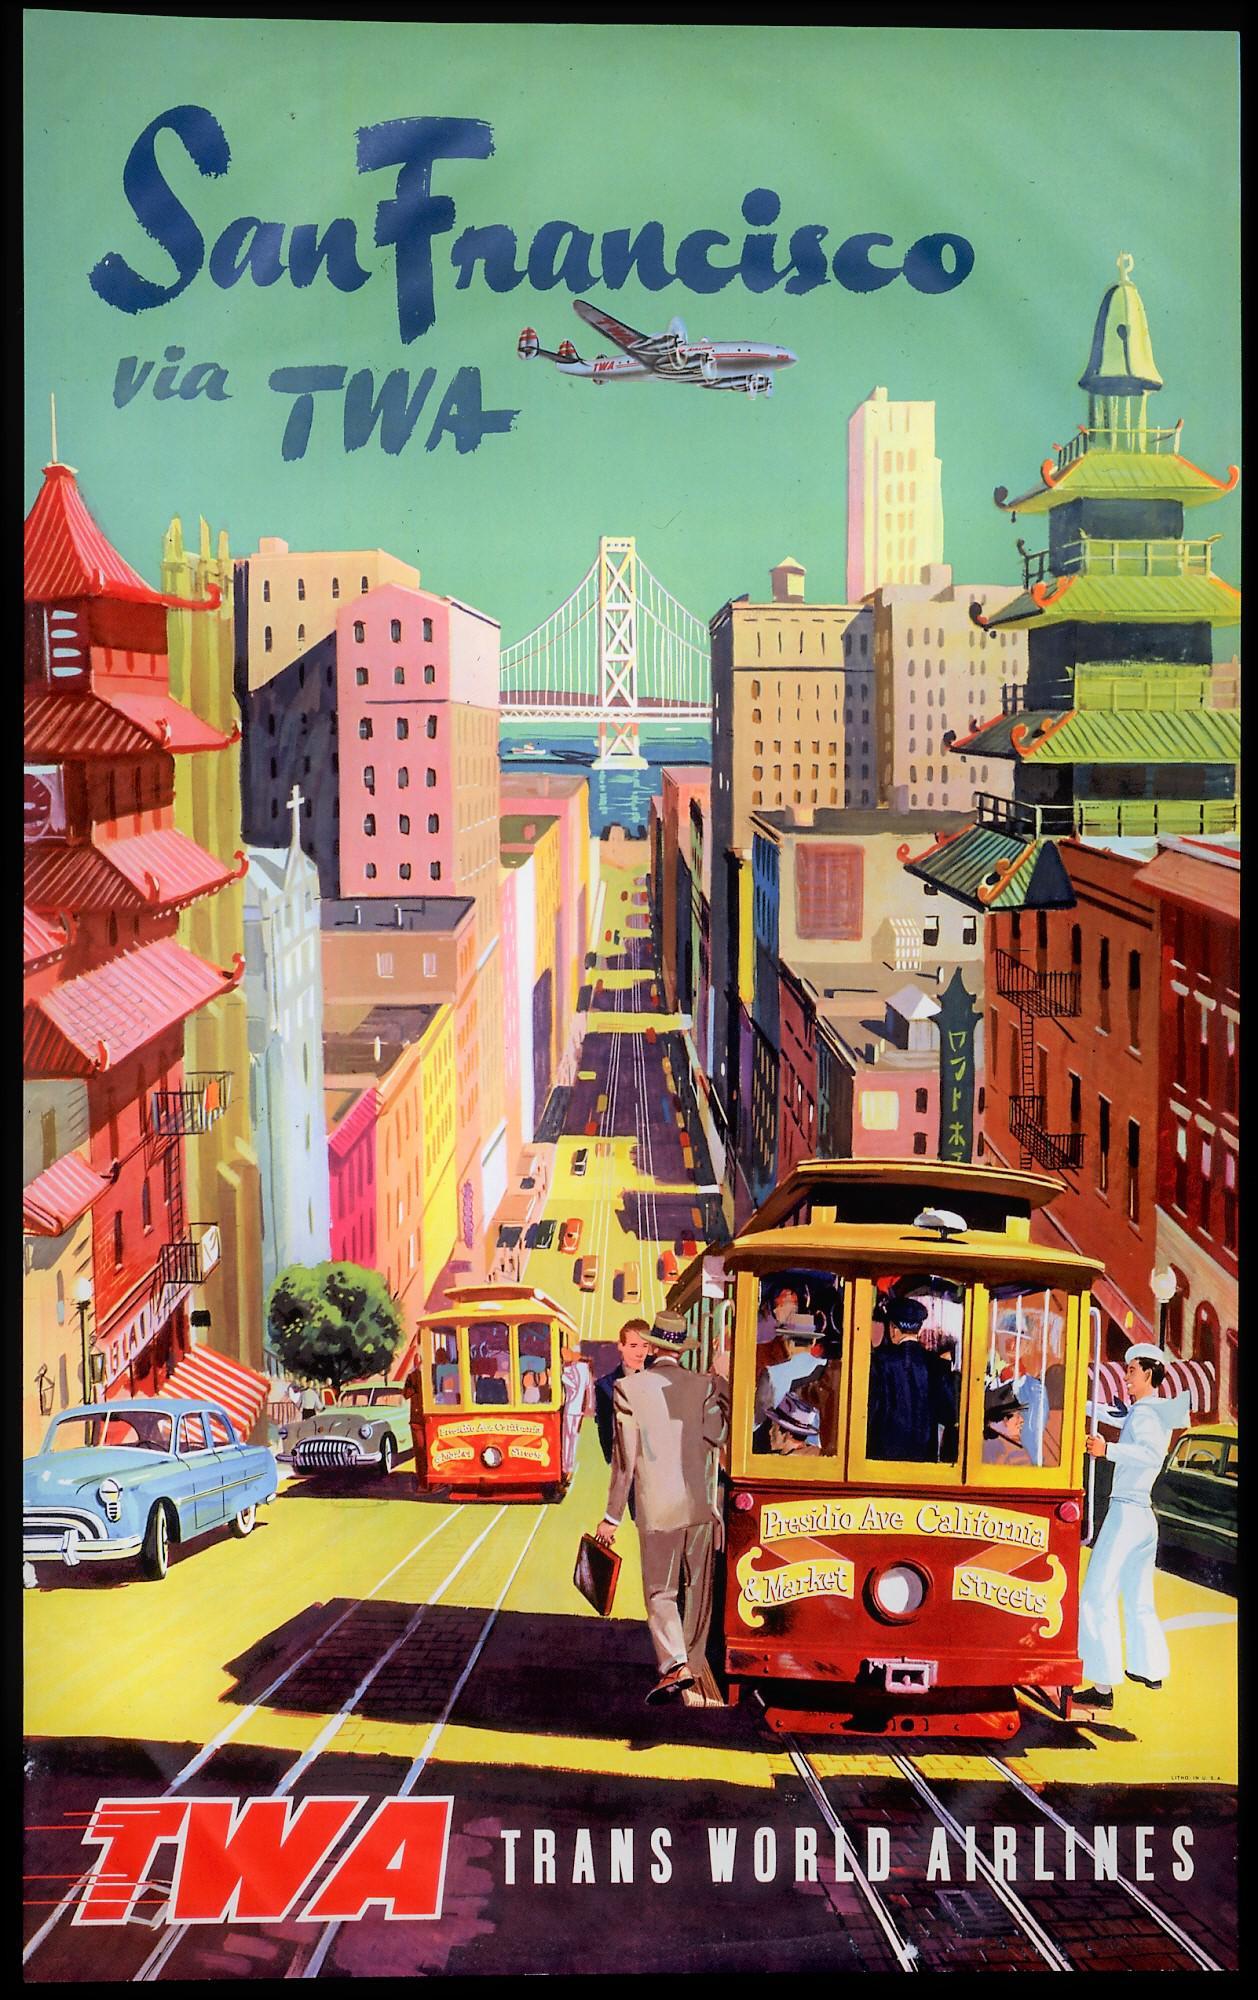 Wonderful Matted And Framed Vintage San Francisco Travel Poster   Image 2 Of 3